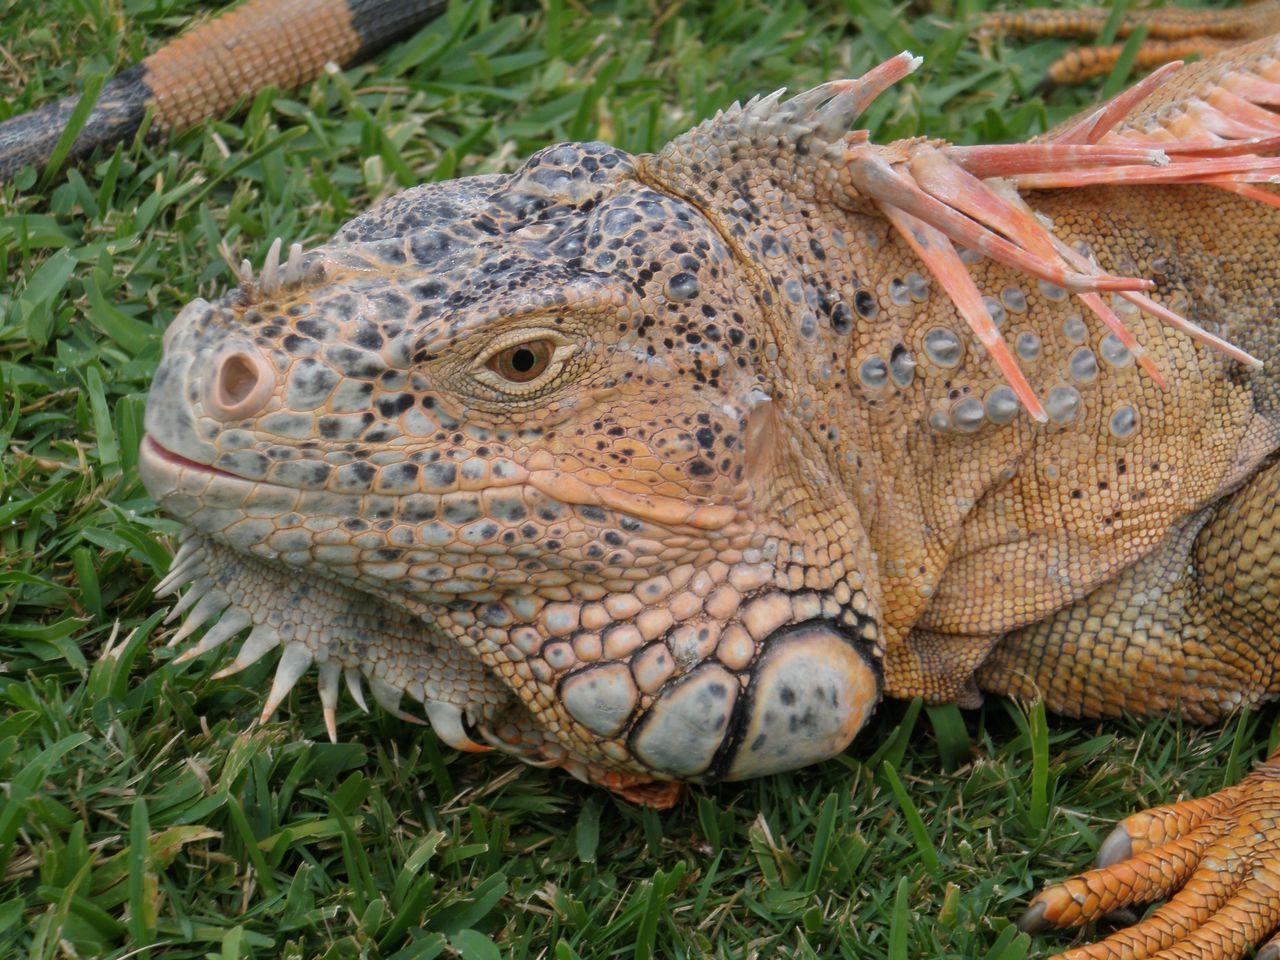 Close-Up Of Iguana On Grassy Field